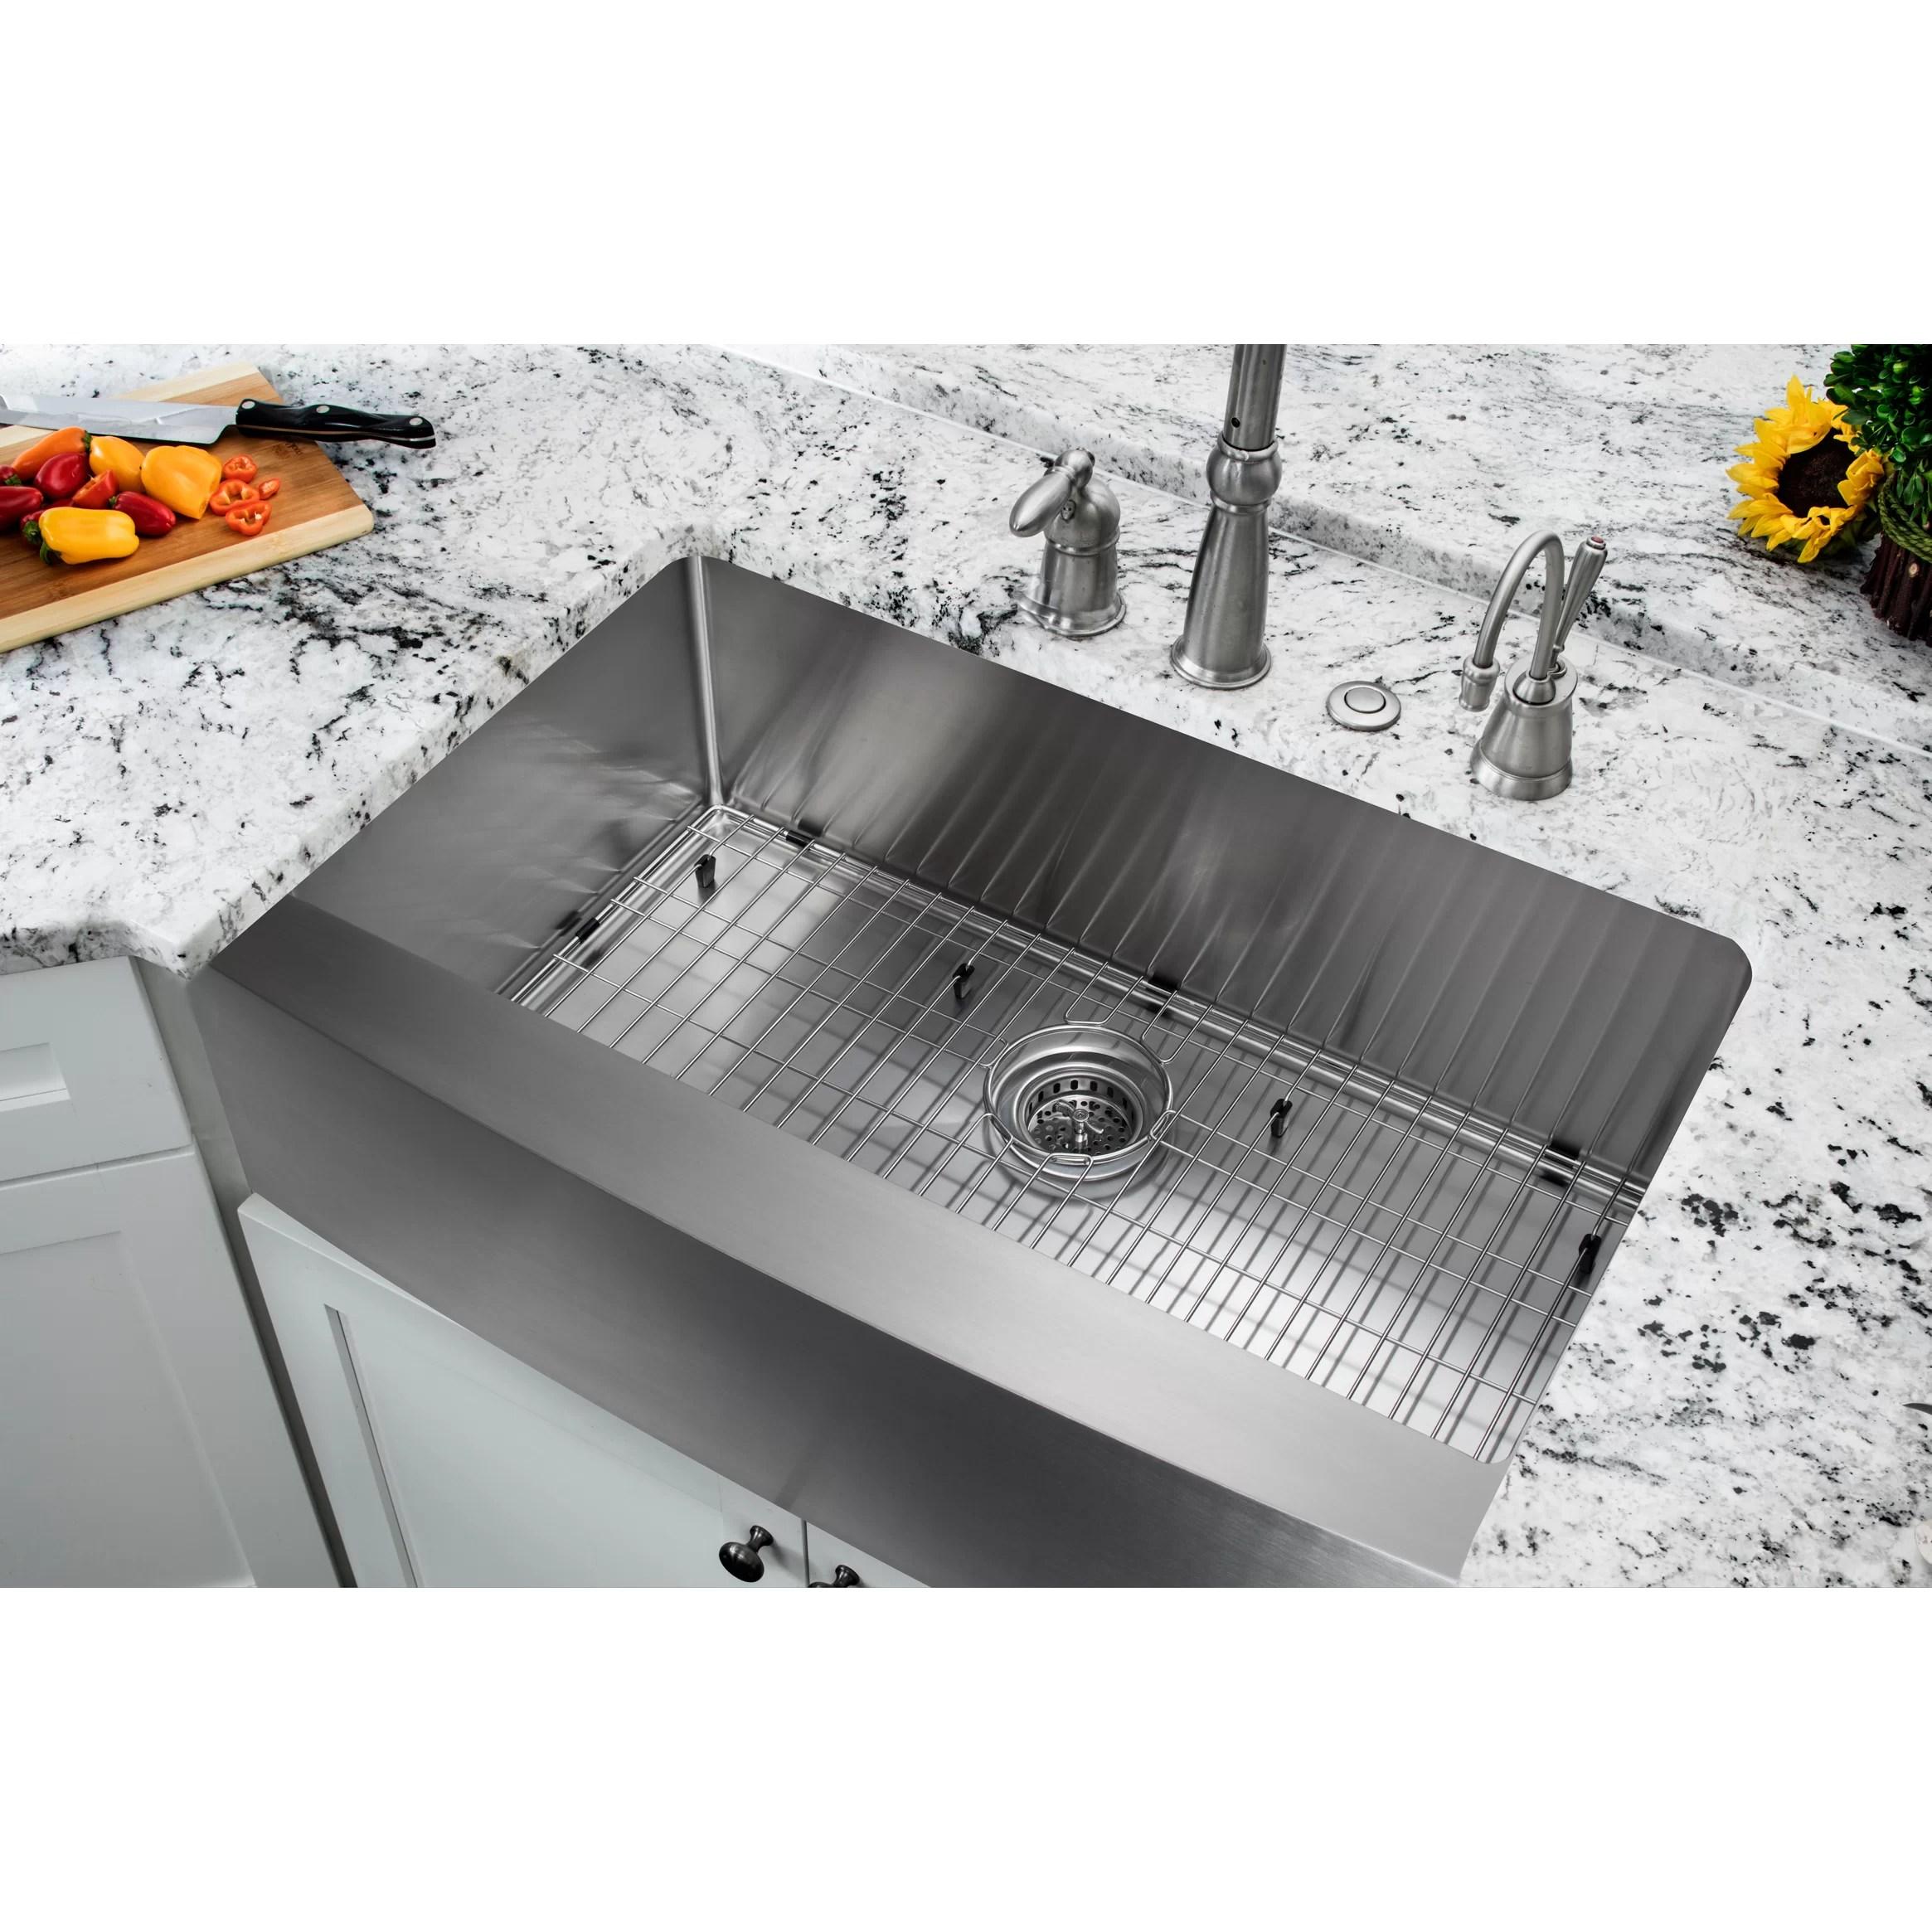 All Kitchen Sinks l c O~Farmhouse+ 5BS 5D+Apron kitchen sink 35 20 75 Single Bowl Farmhouse Apron Kitchen Sink